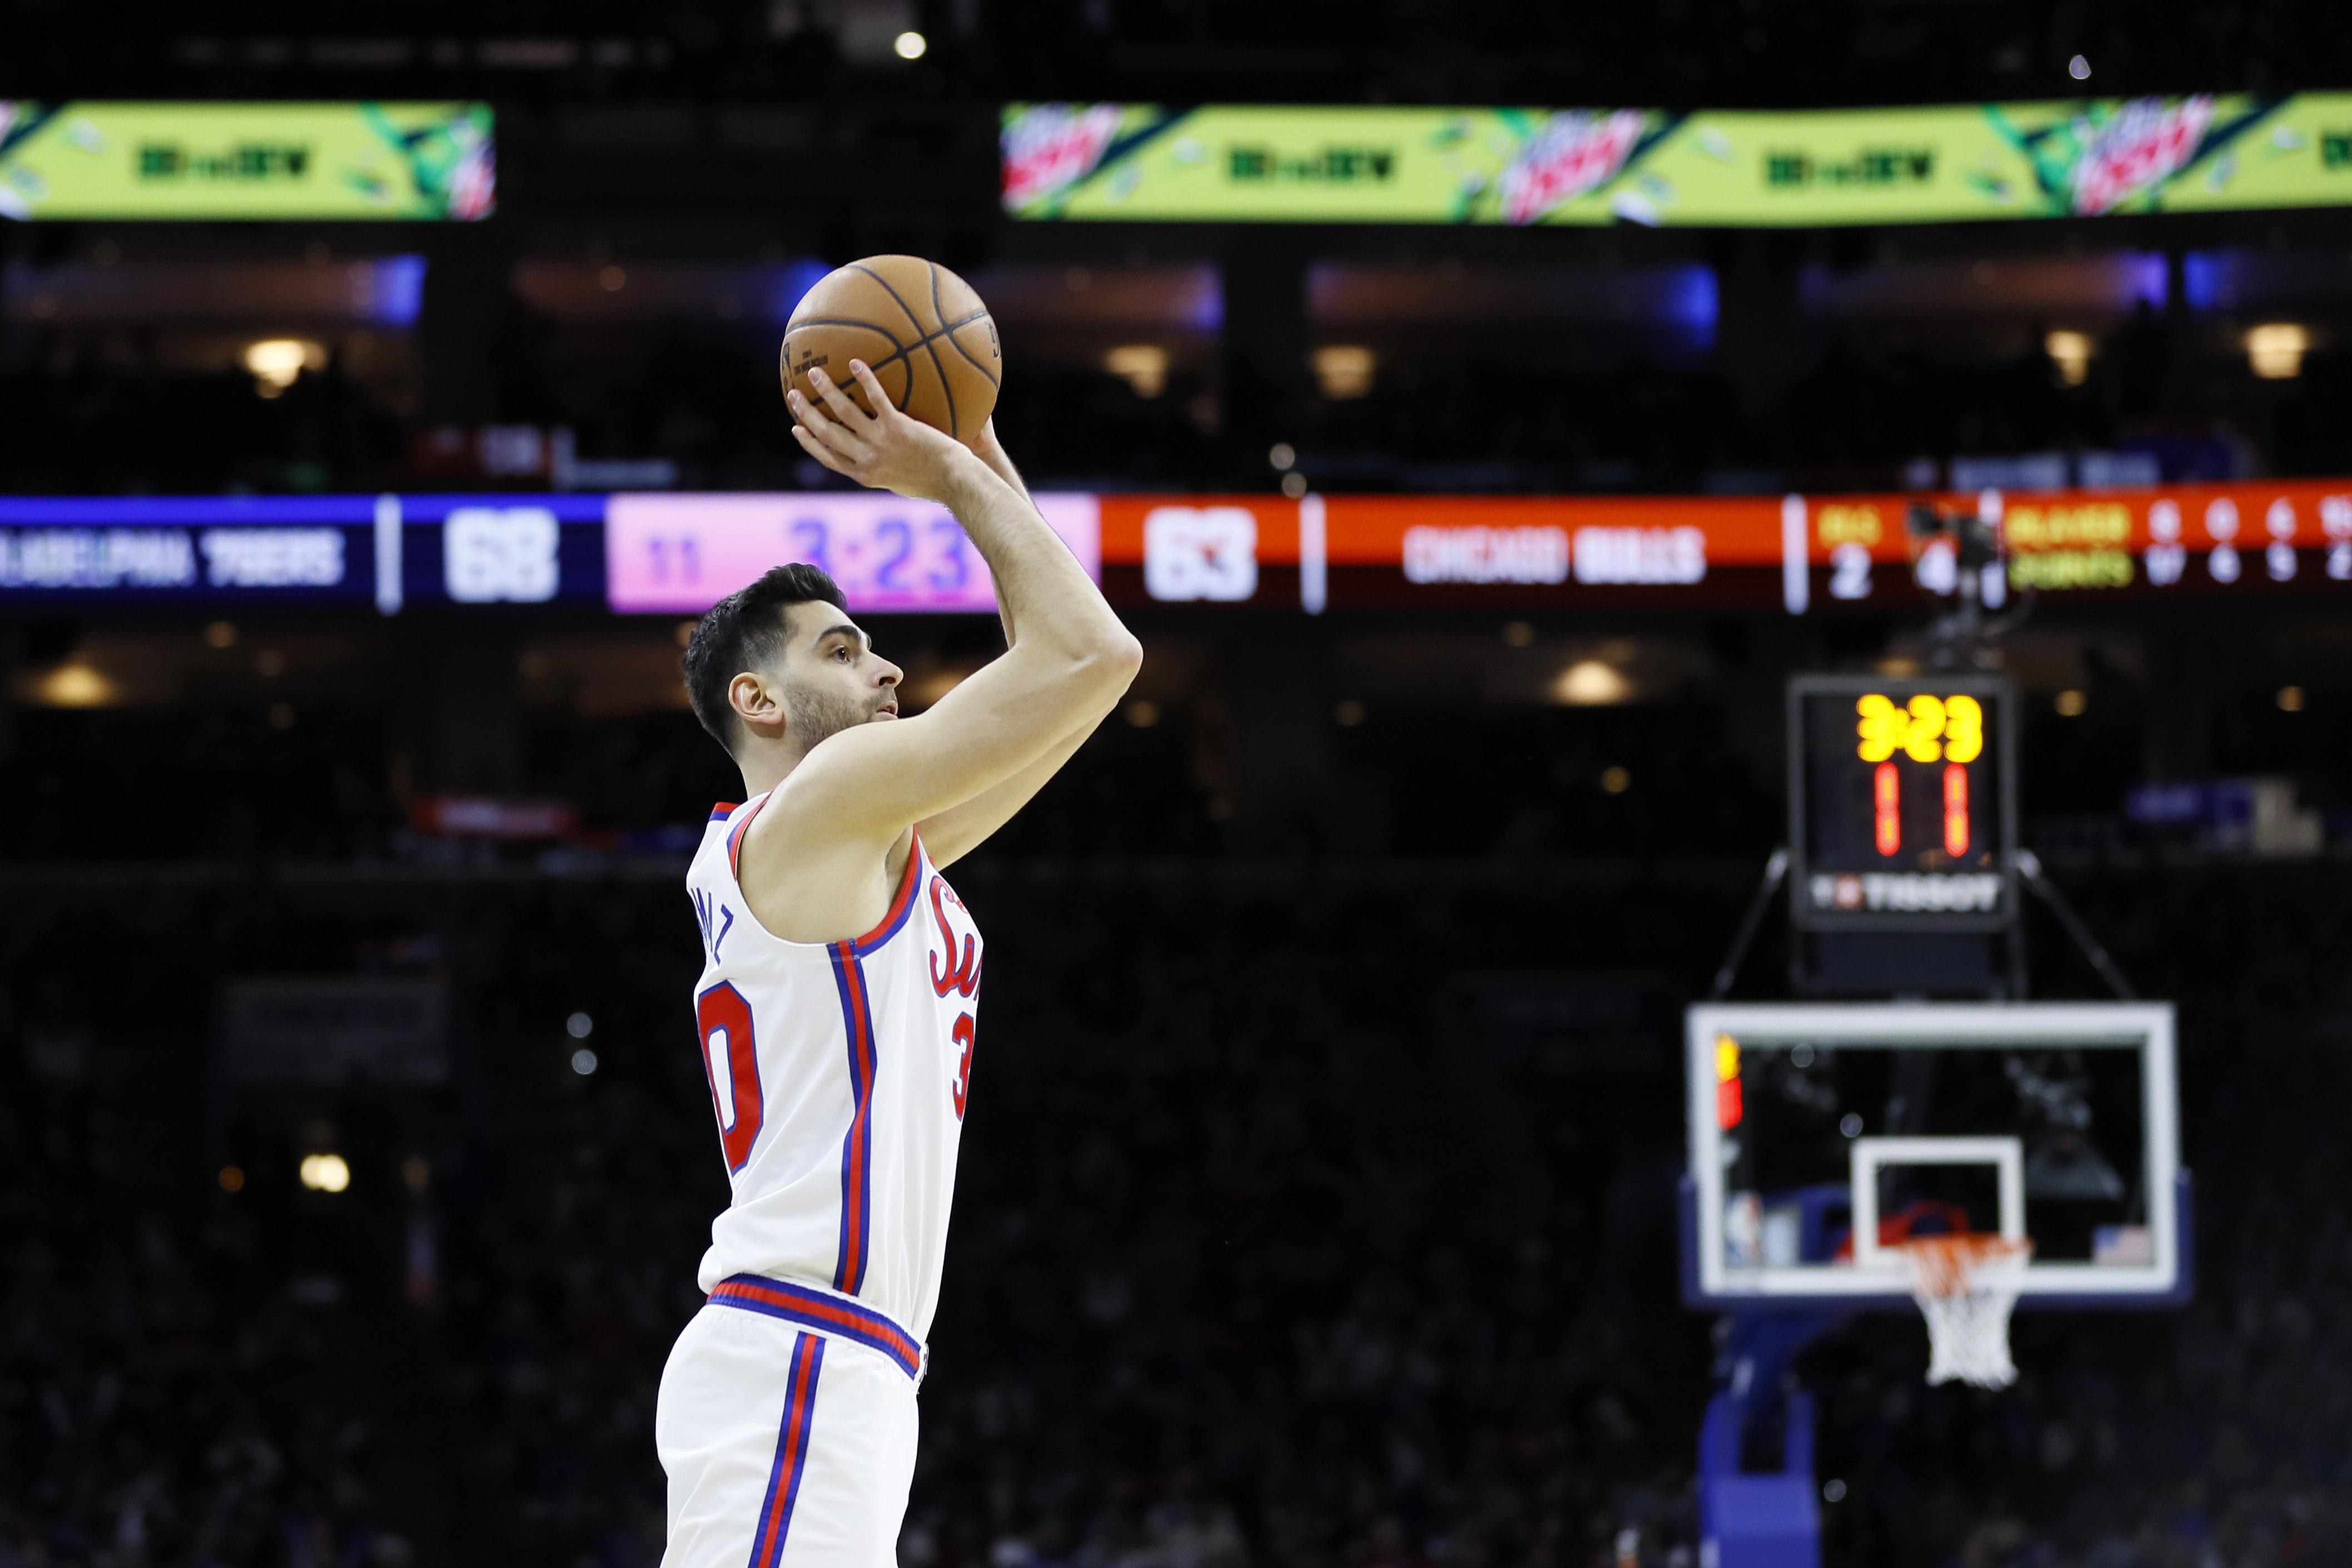 Korkmaz gets hot, scores 24 to lift 76ers over Bulls 100-89